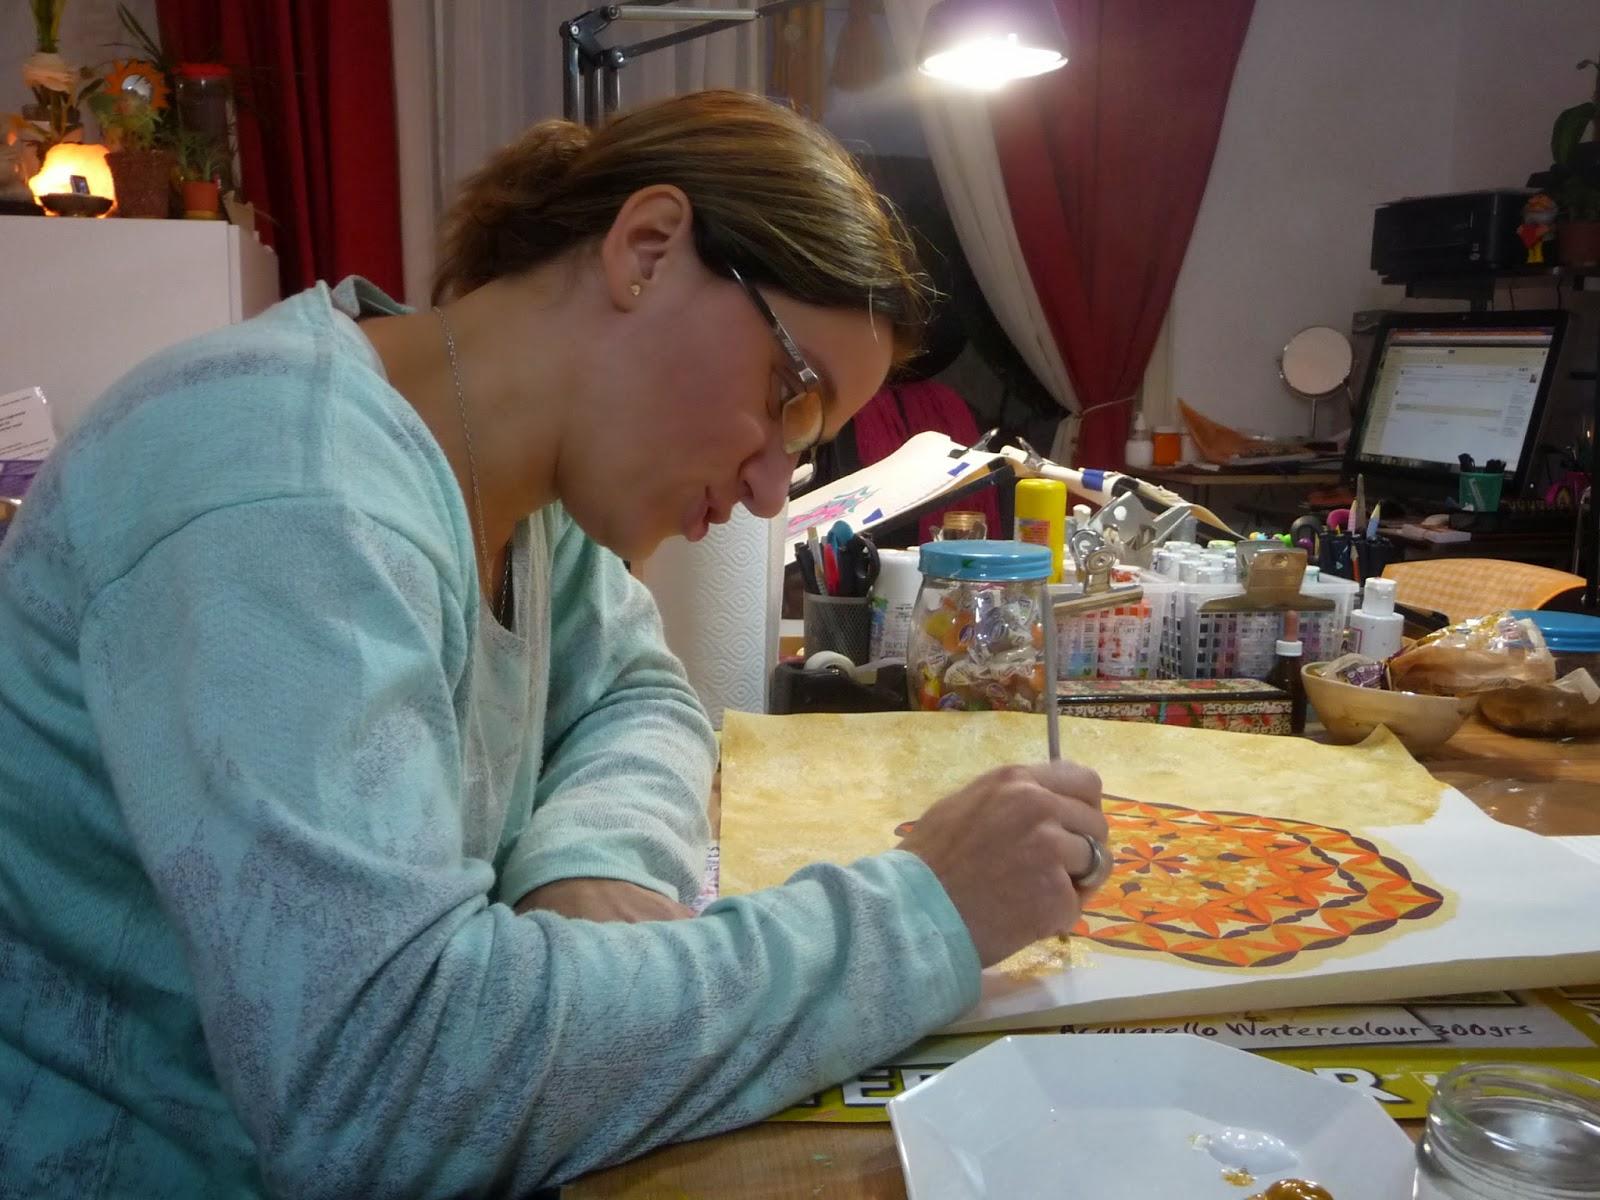 como pintar mandalas, arte terapia con mandalas